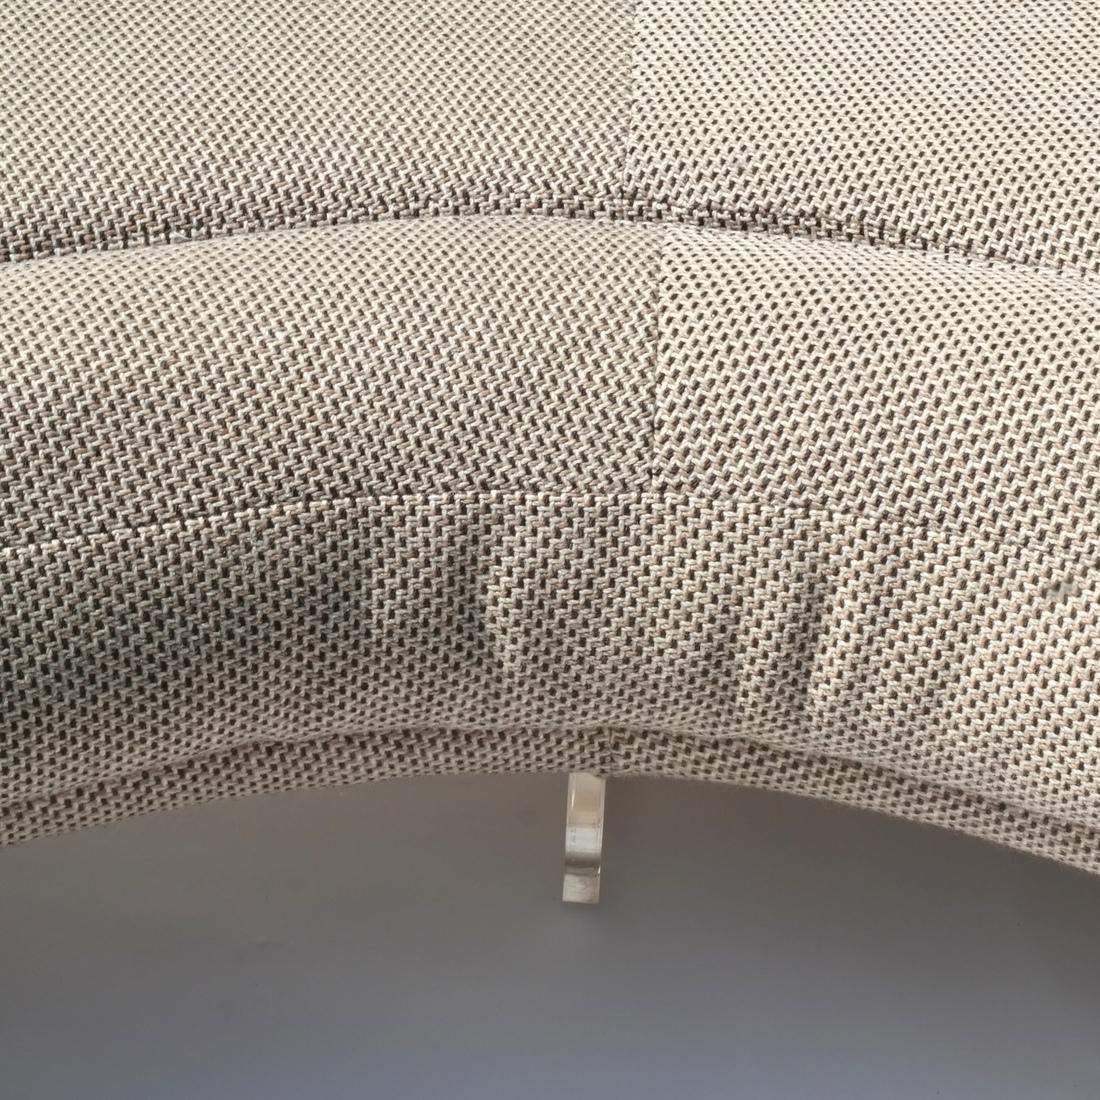 Vladimir Kagan Designed Boomerang Sofa - 2